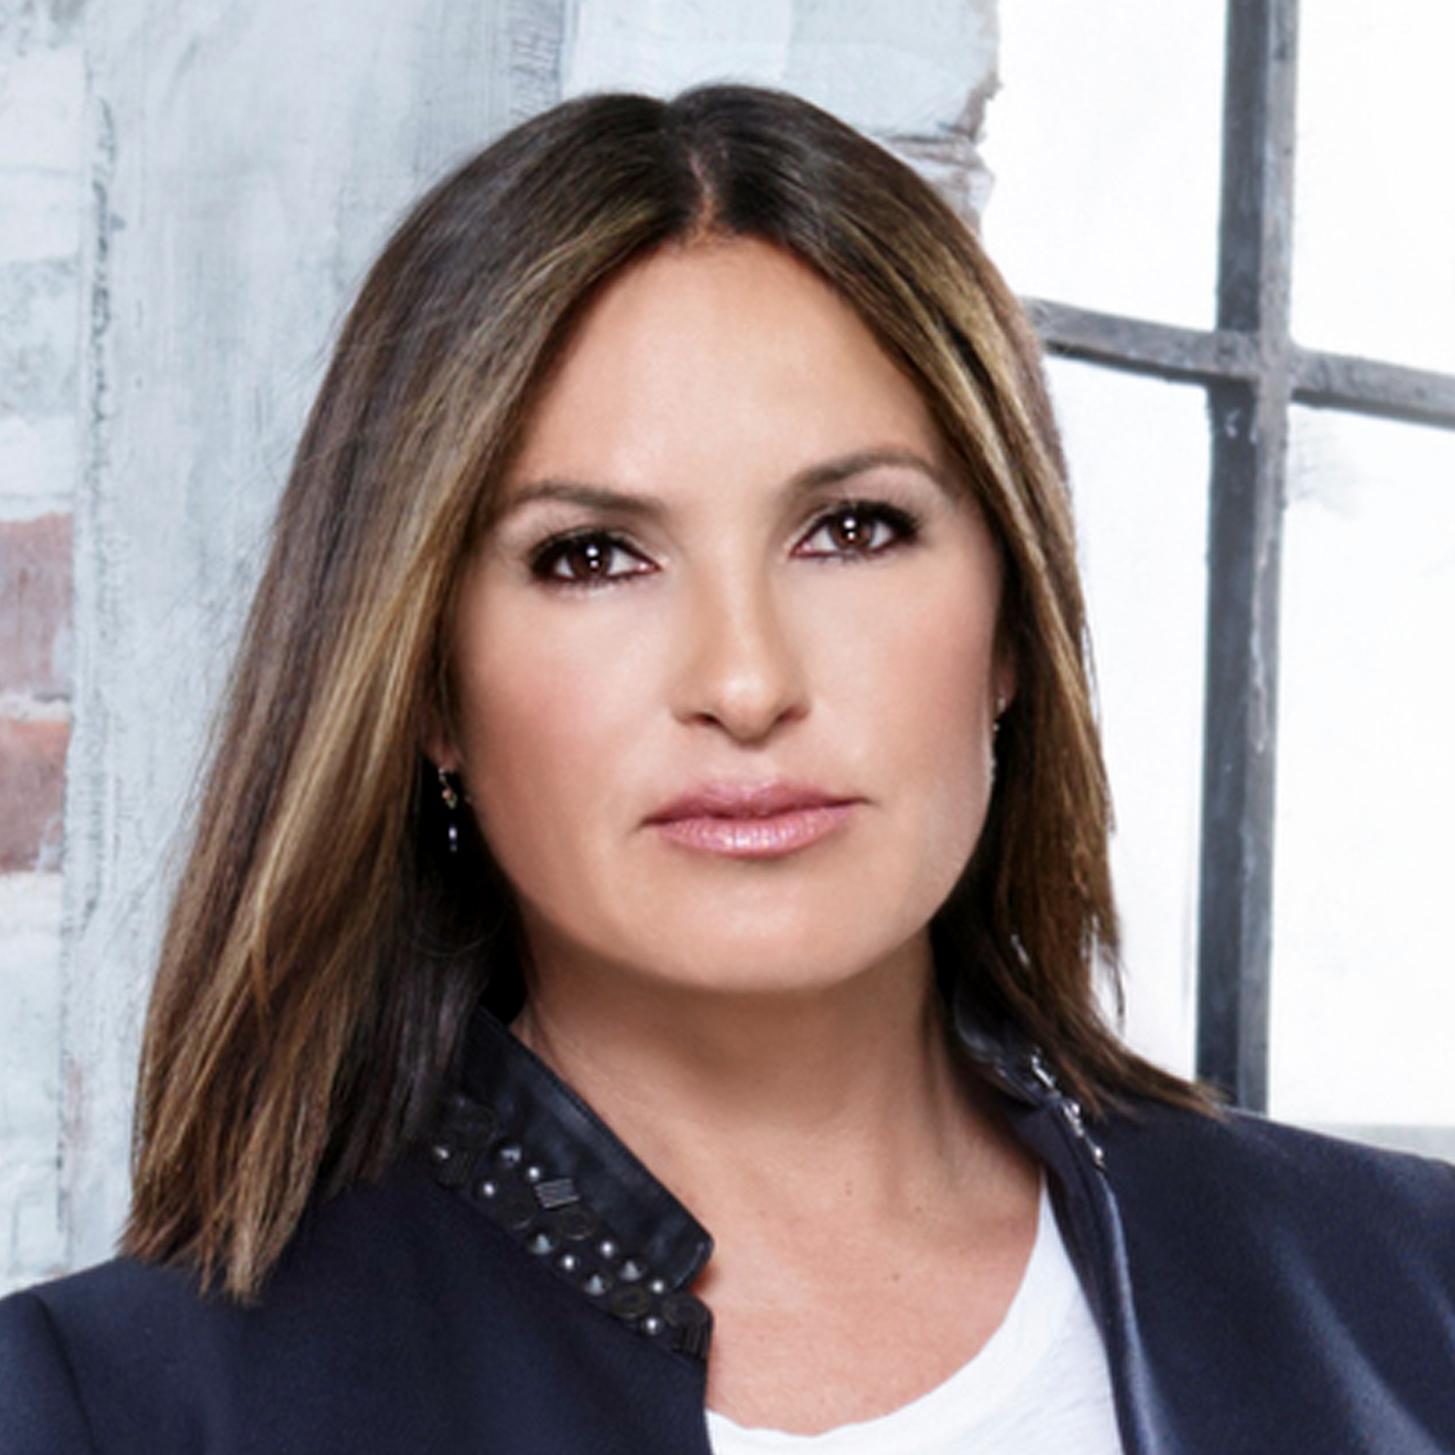 Mariska Hargitay | About | Law & Order: SVU | NBC